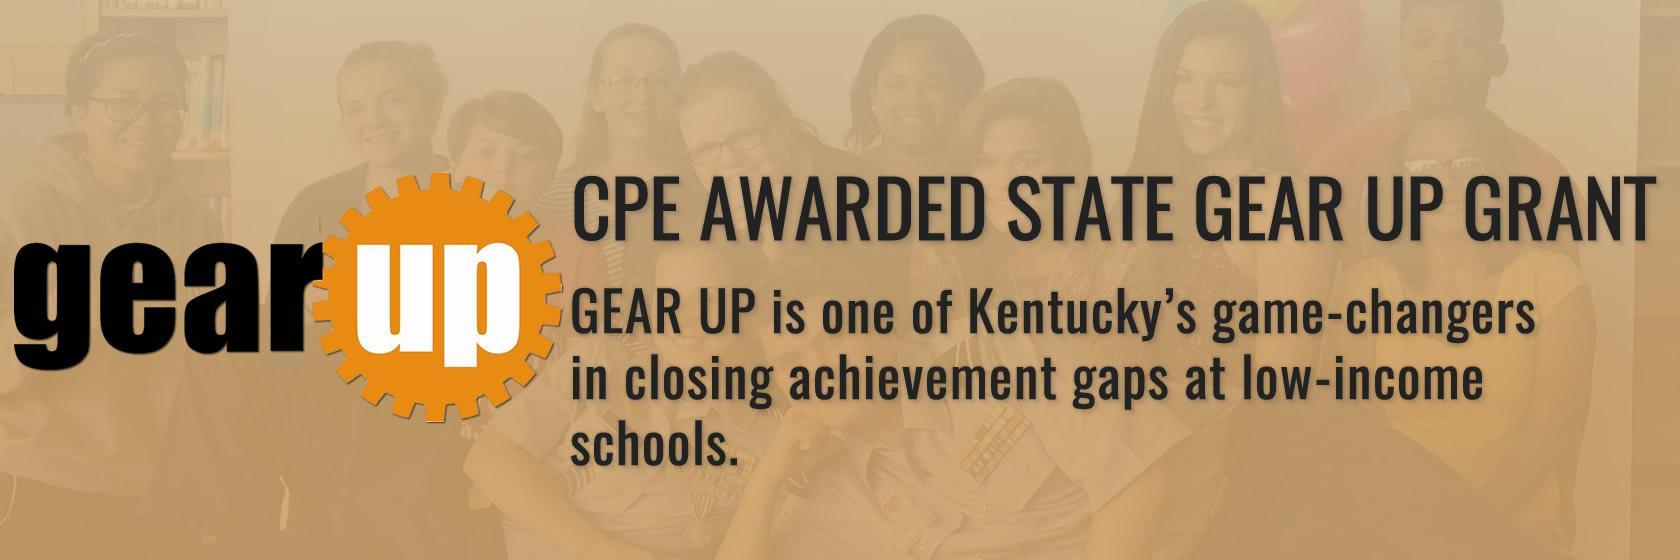 CPE wins GEAR UP grant award.